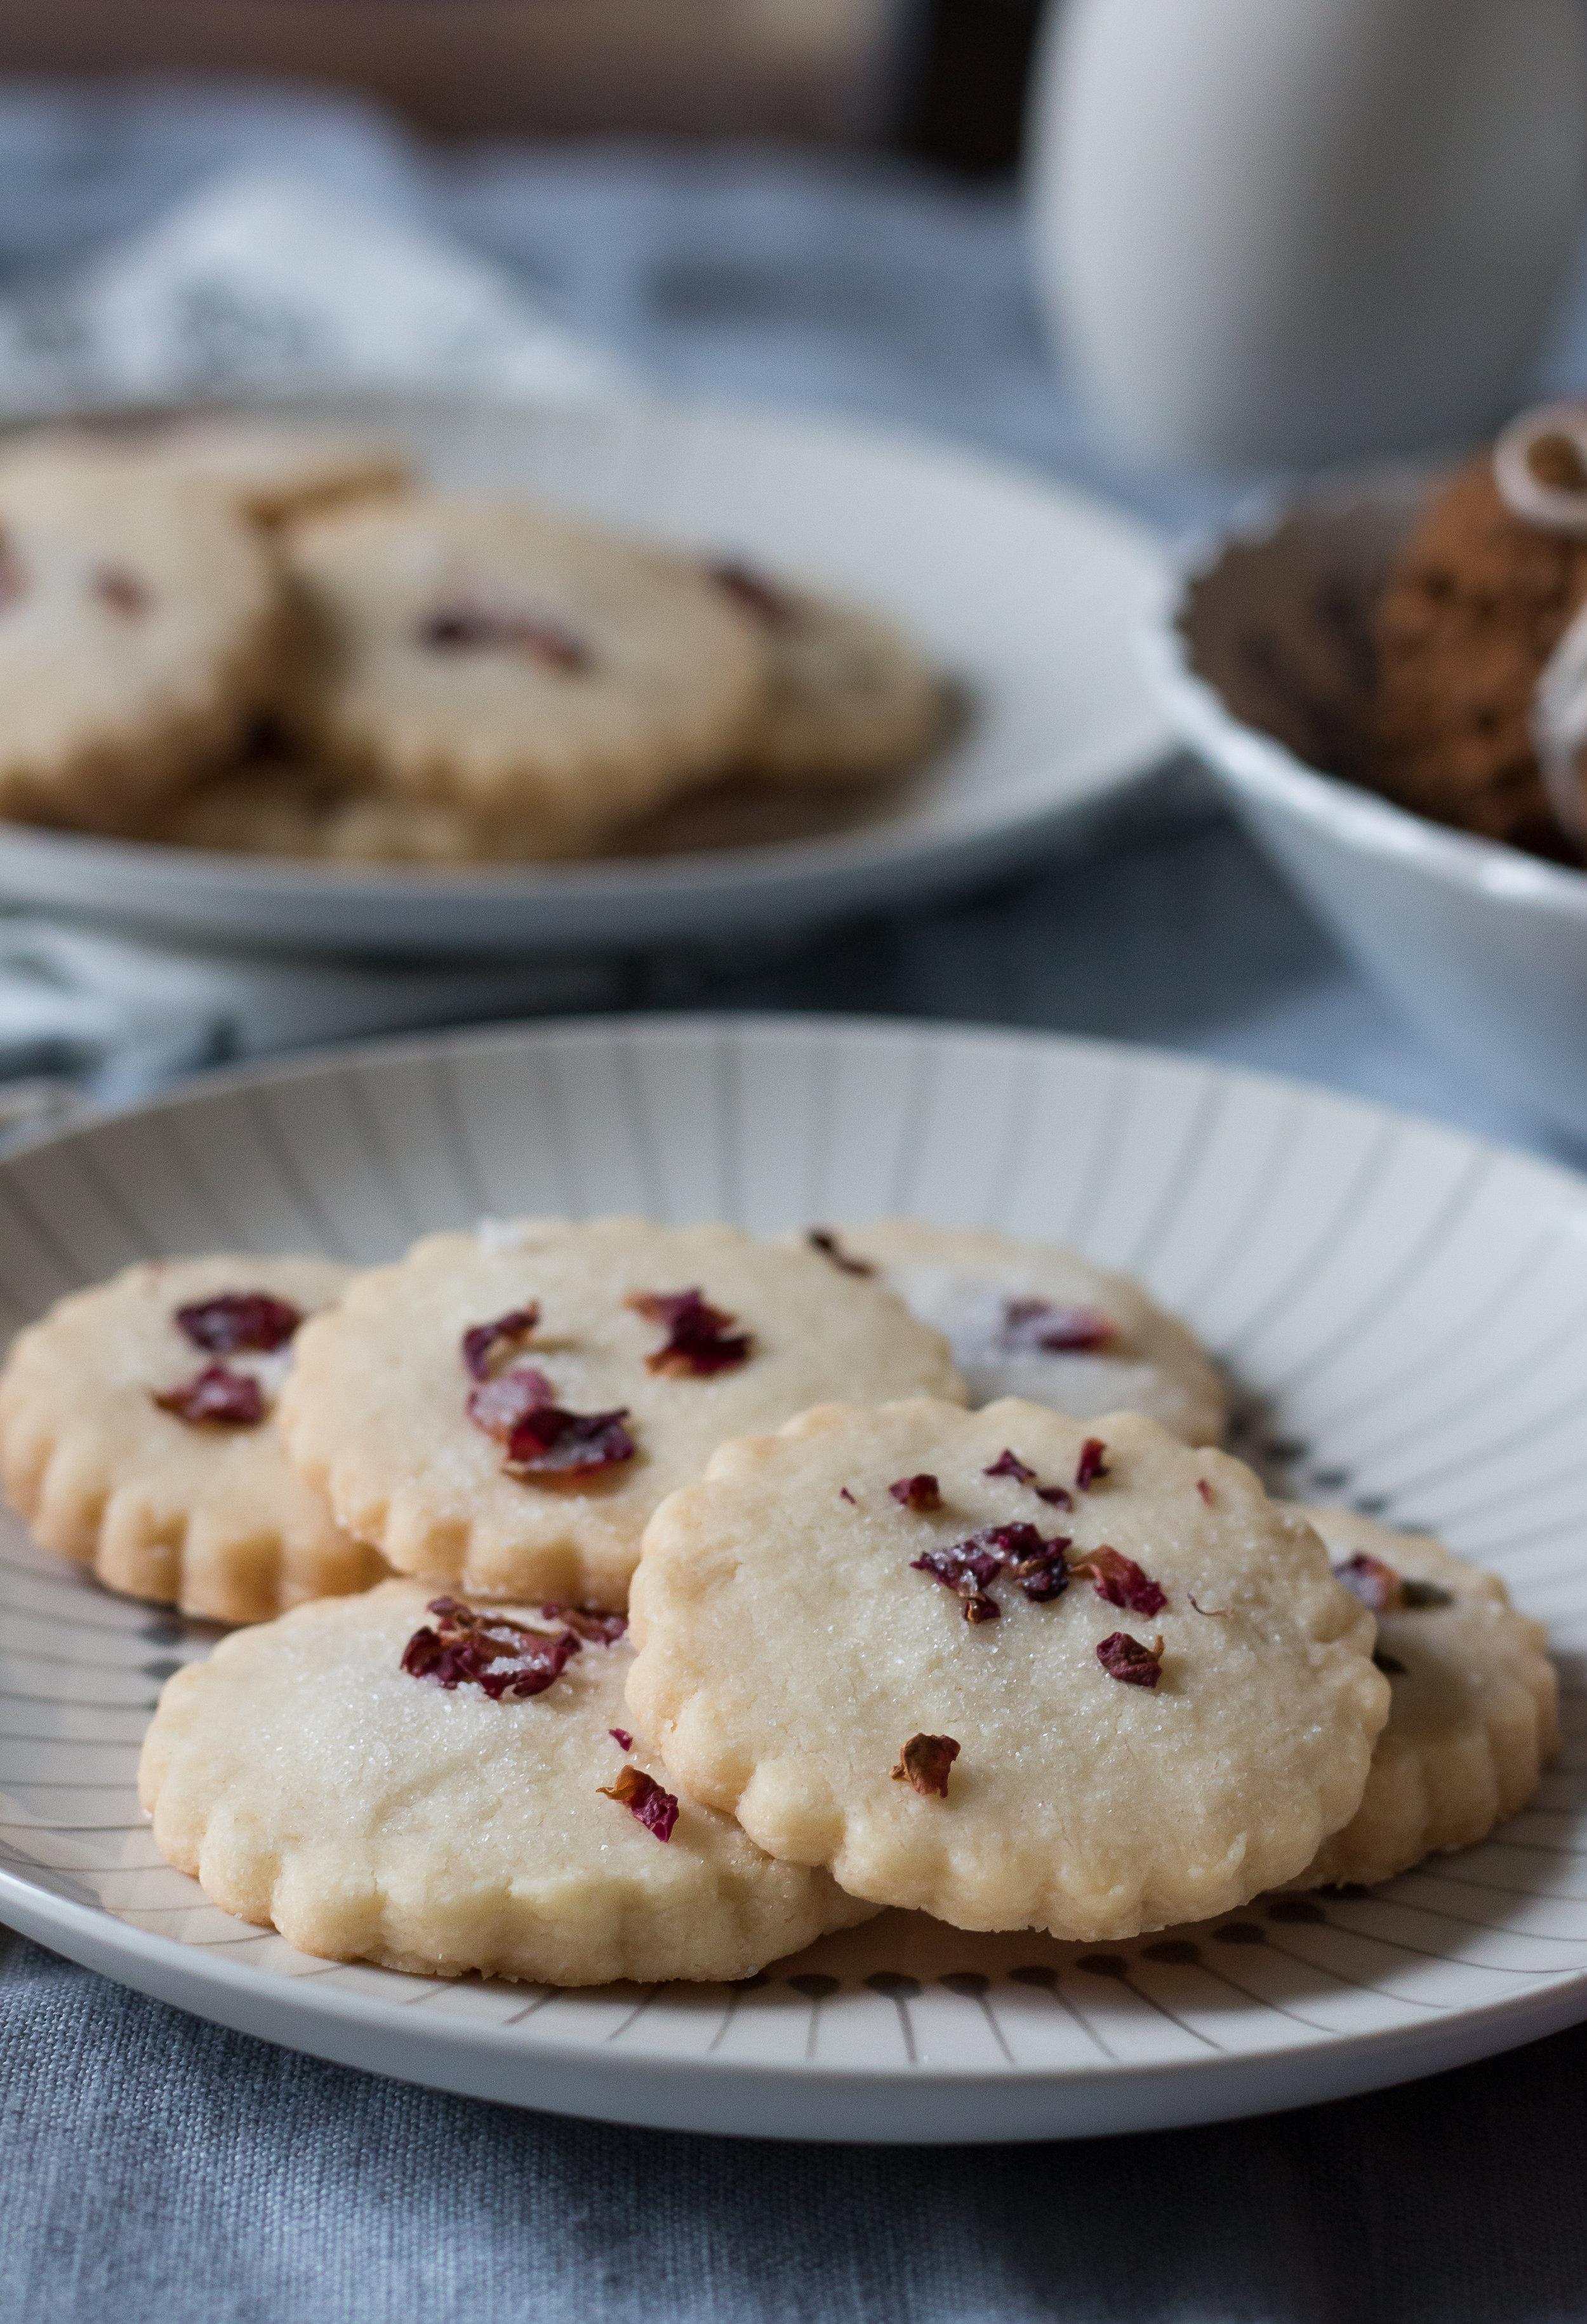 Shortbread Cookies with Rose Petal Decoration   Linden & Lavender